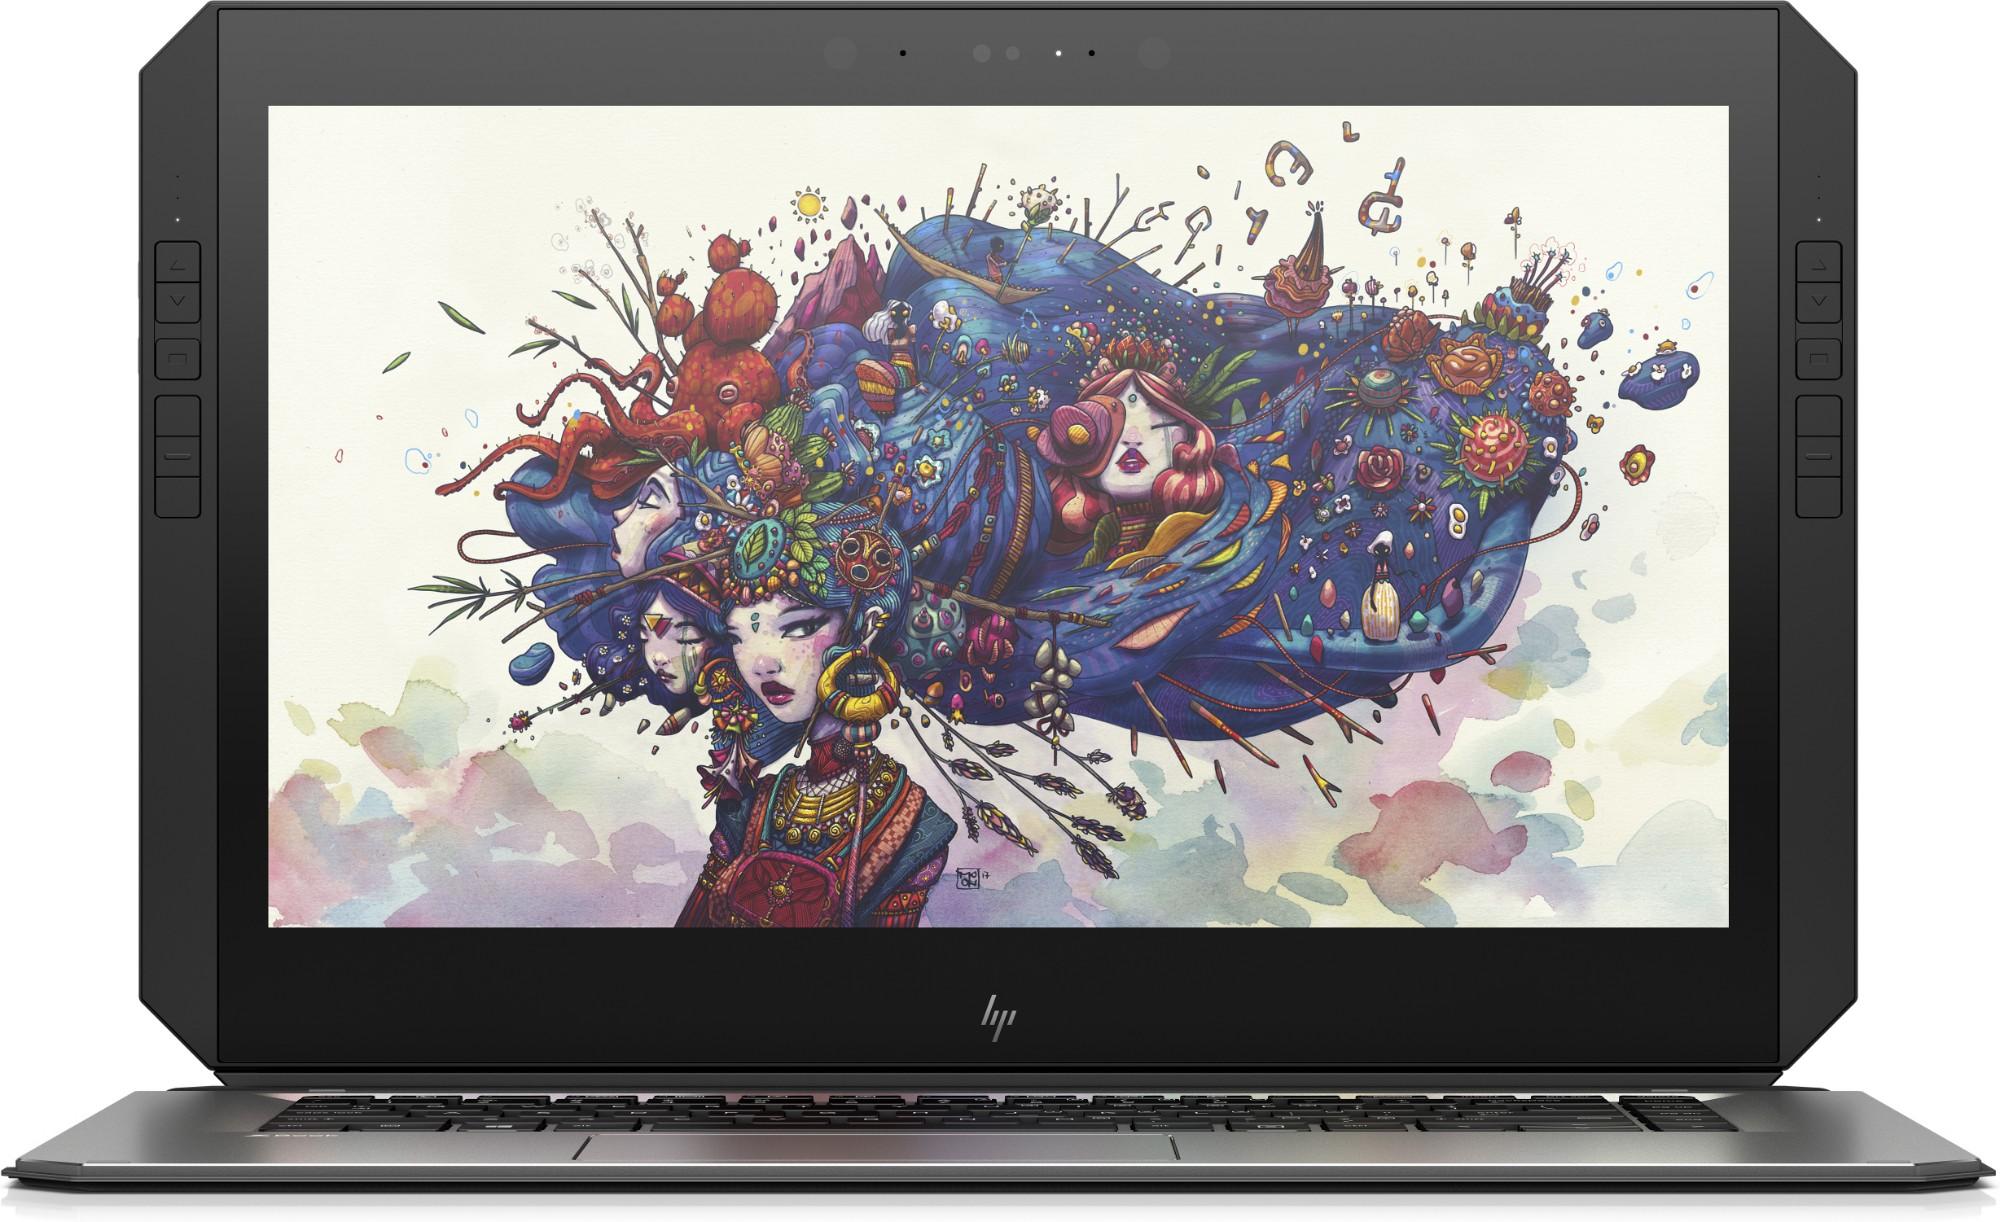 HP ZBook x2 x2 G4 2.70GHz i7-7500U 14